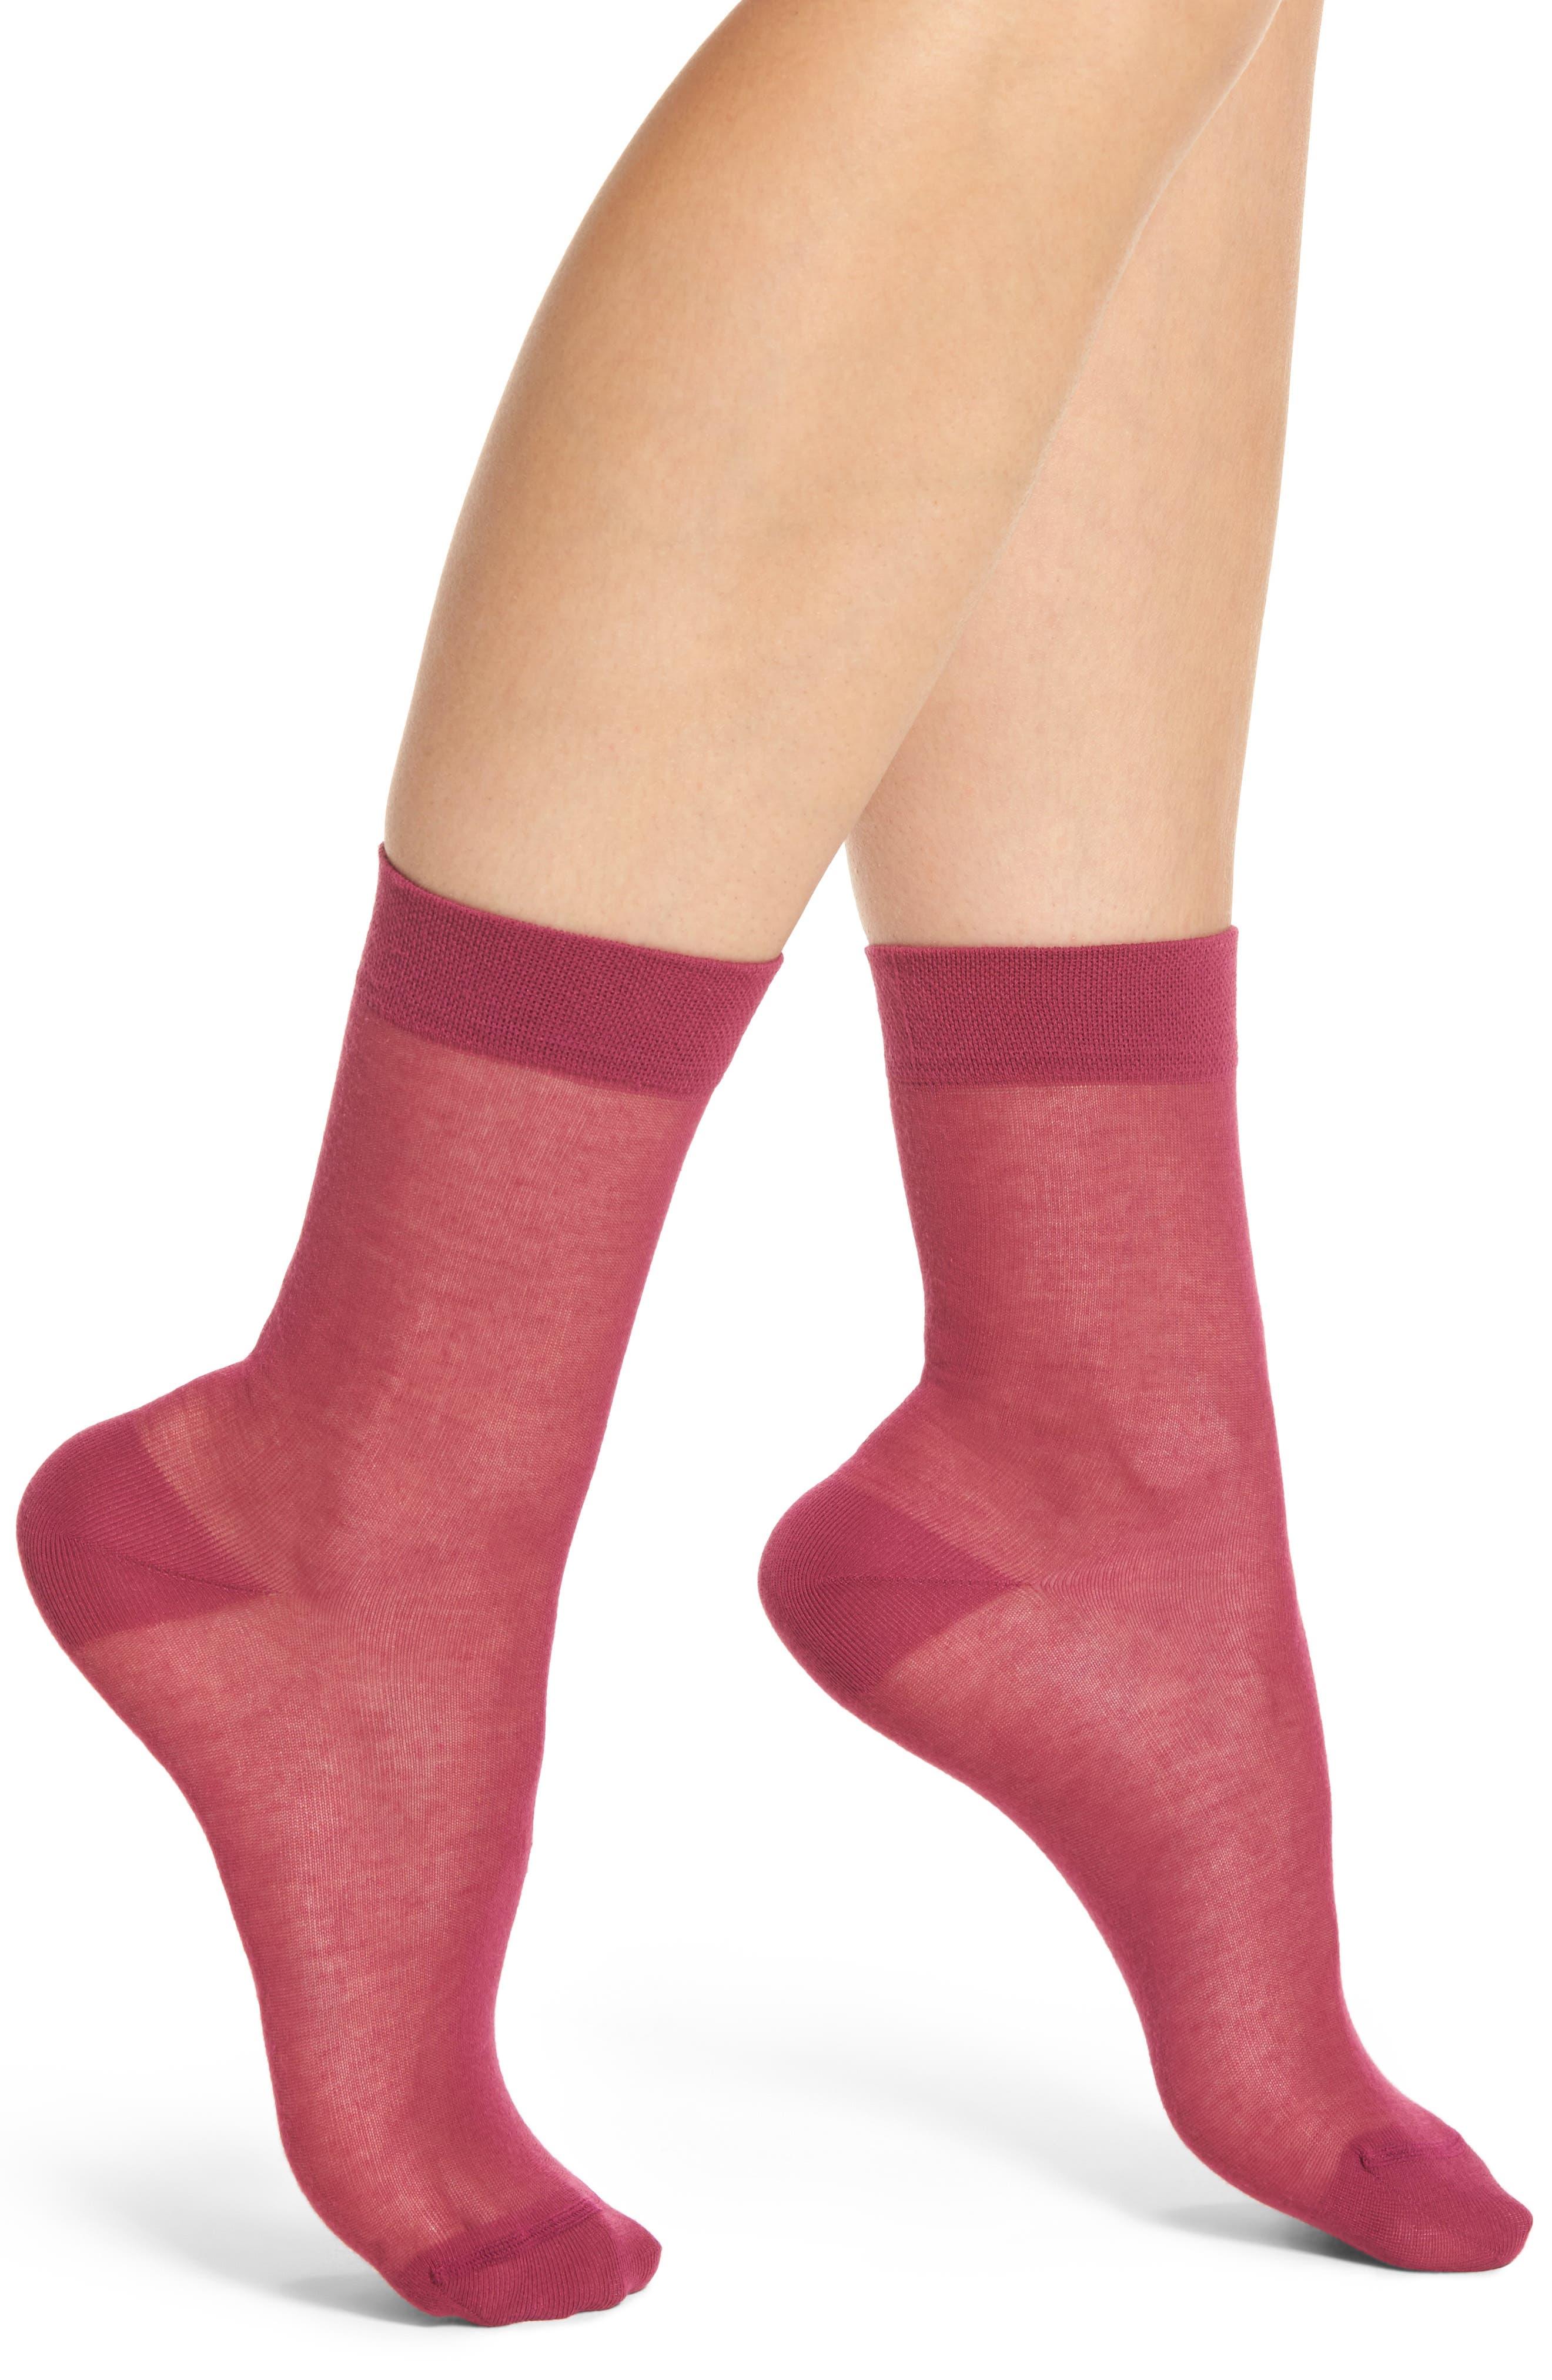 Alternate Image 1 Selected - Chelsea28 Sheer Crew Socks